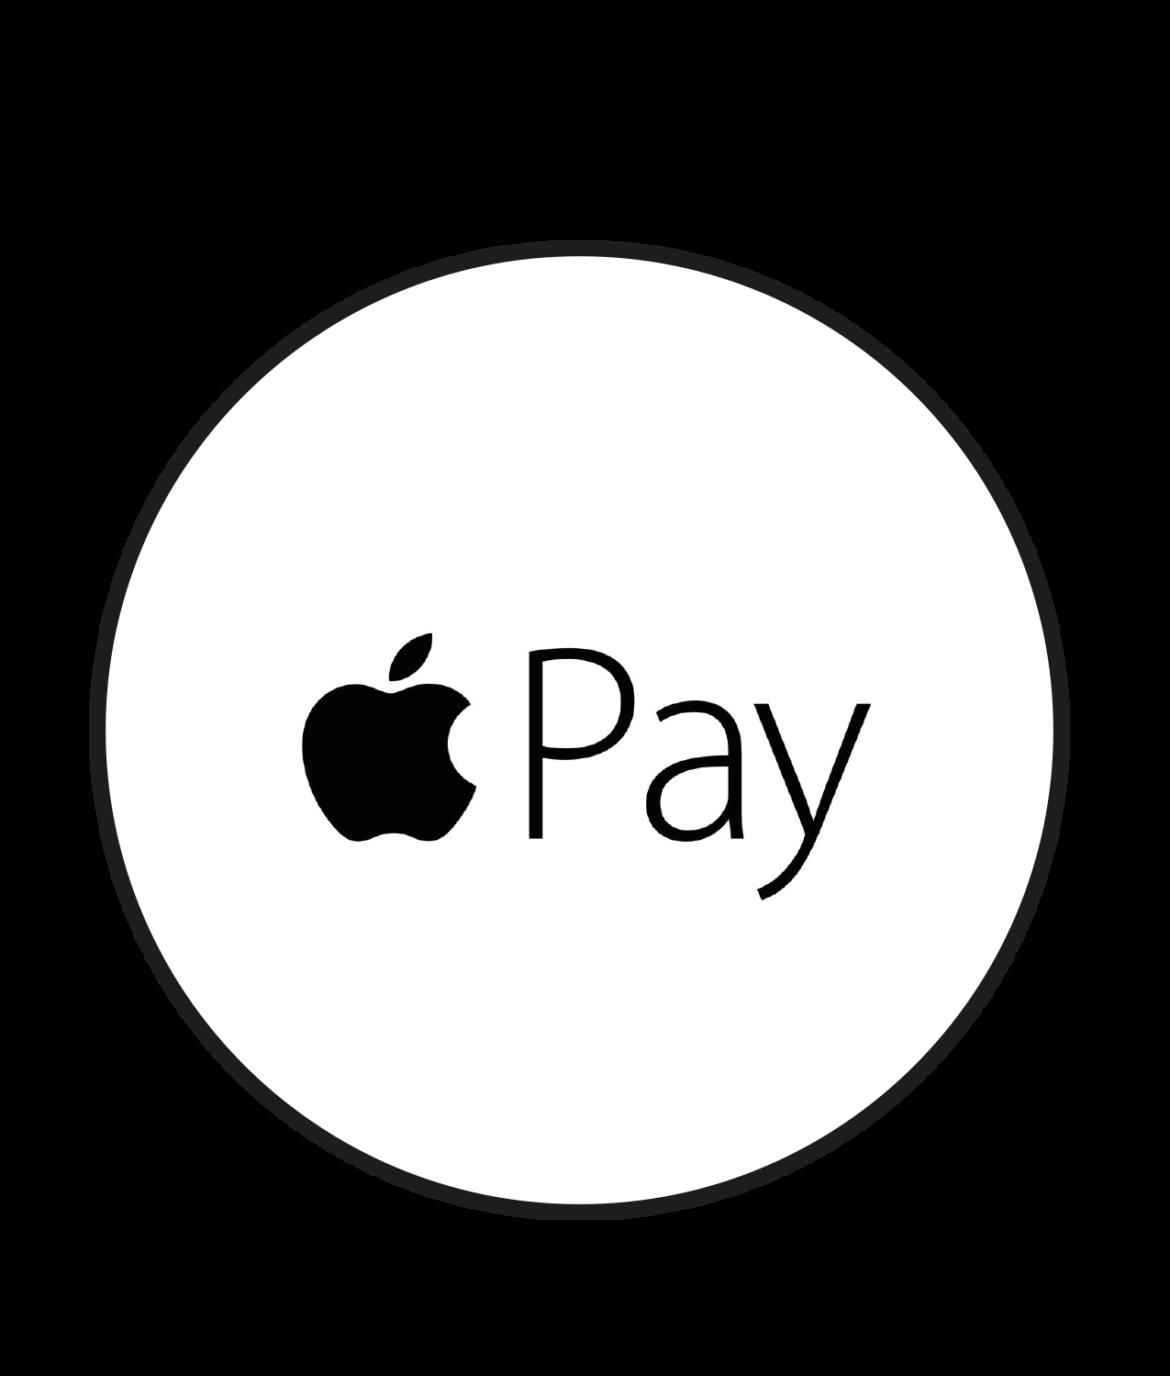 Apple Pay Logo Circle - Thyngs - Apple Pay Logo PNG